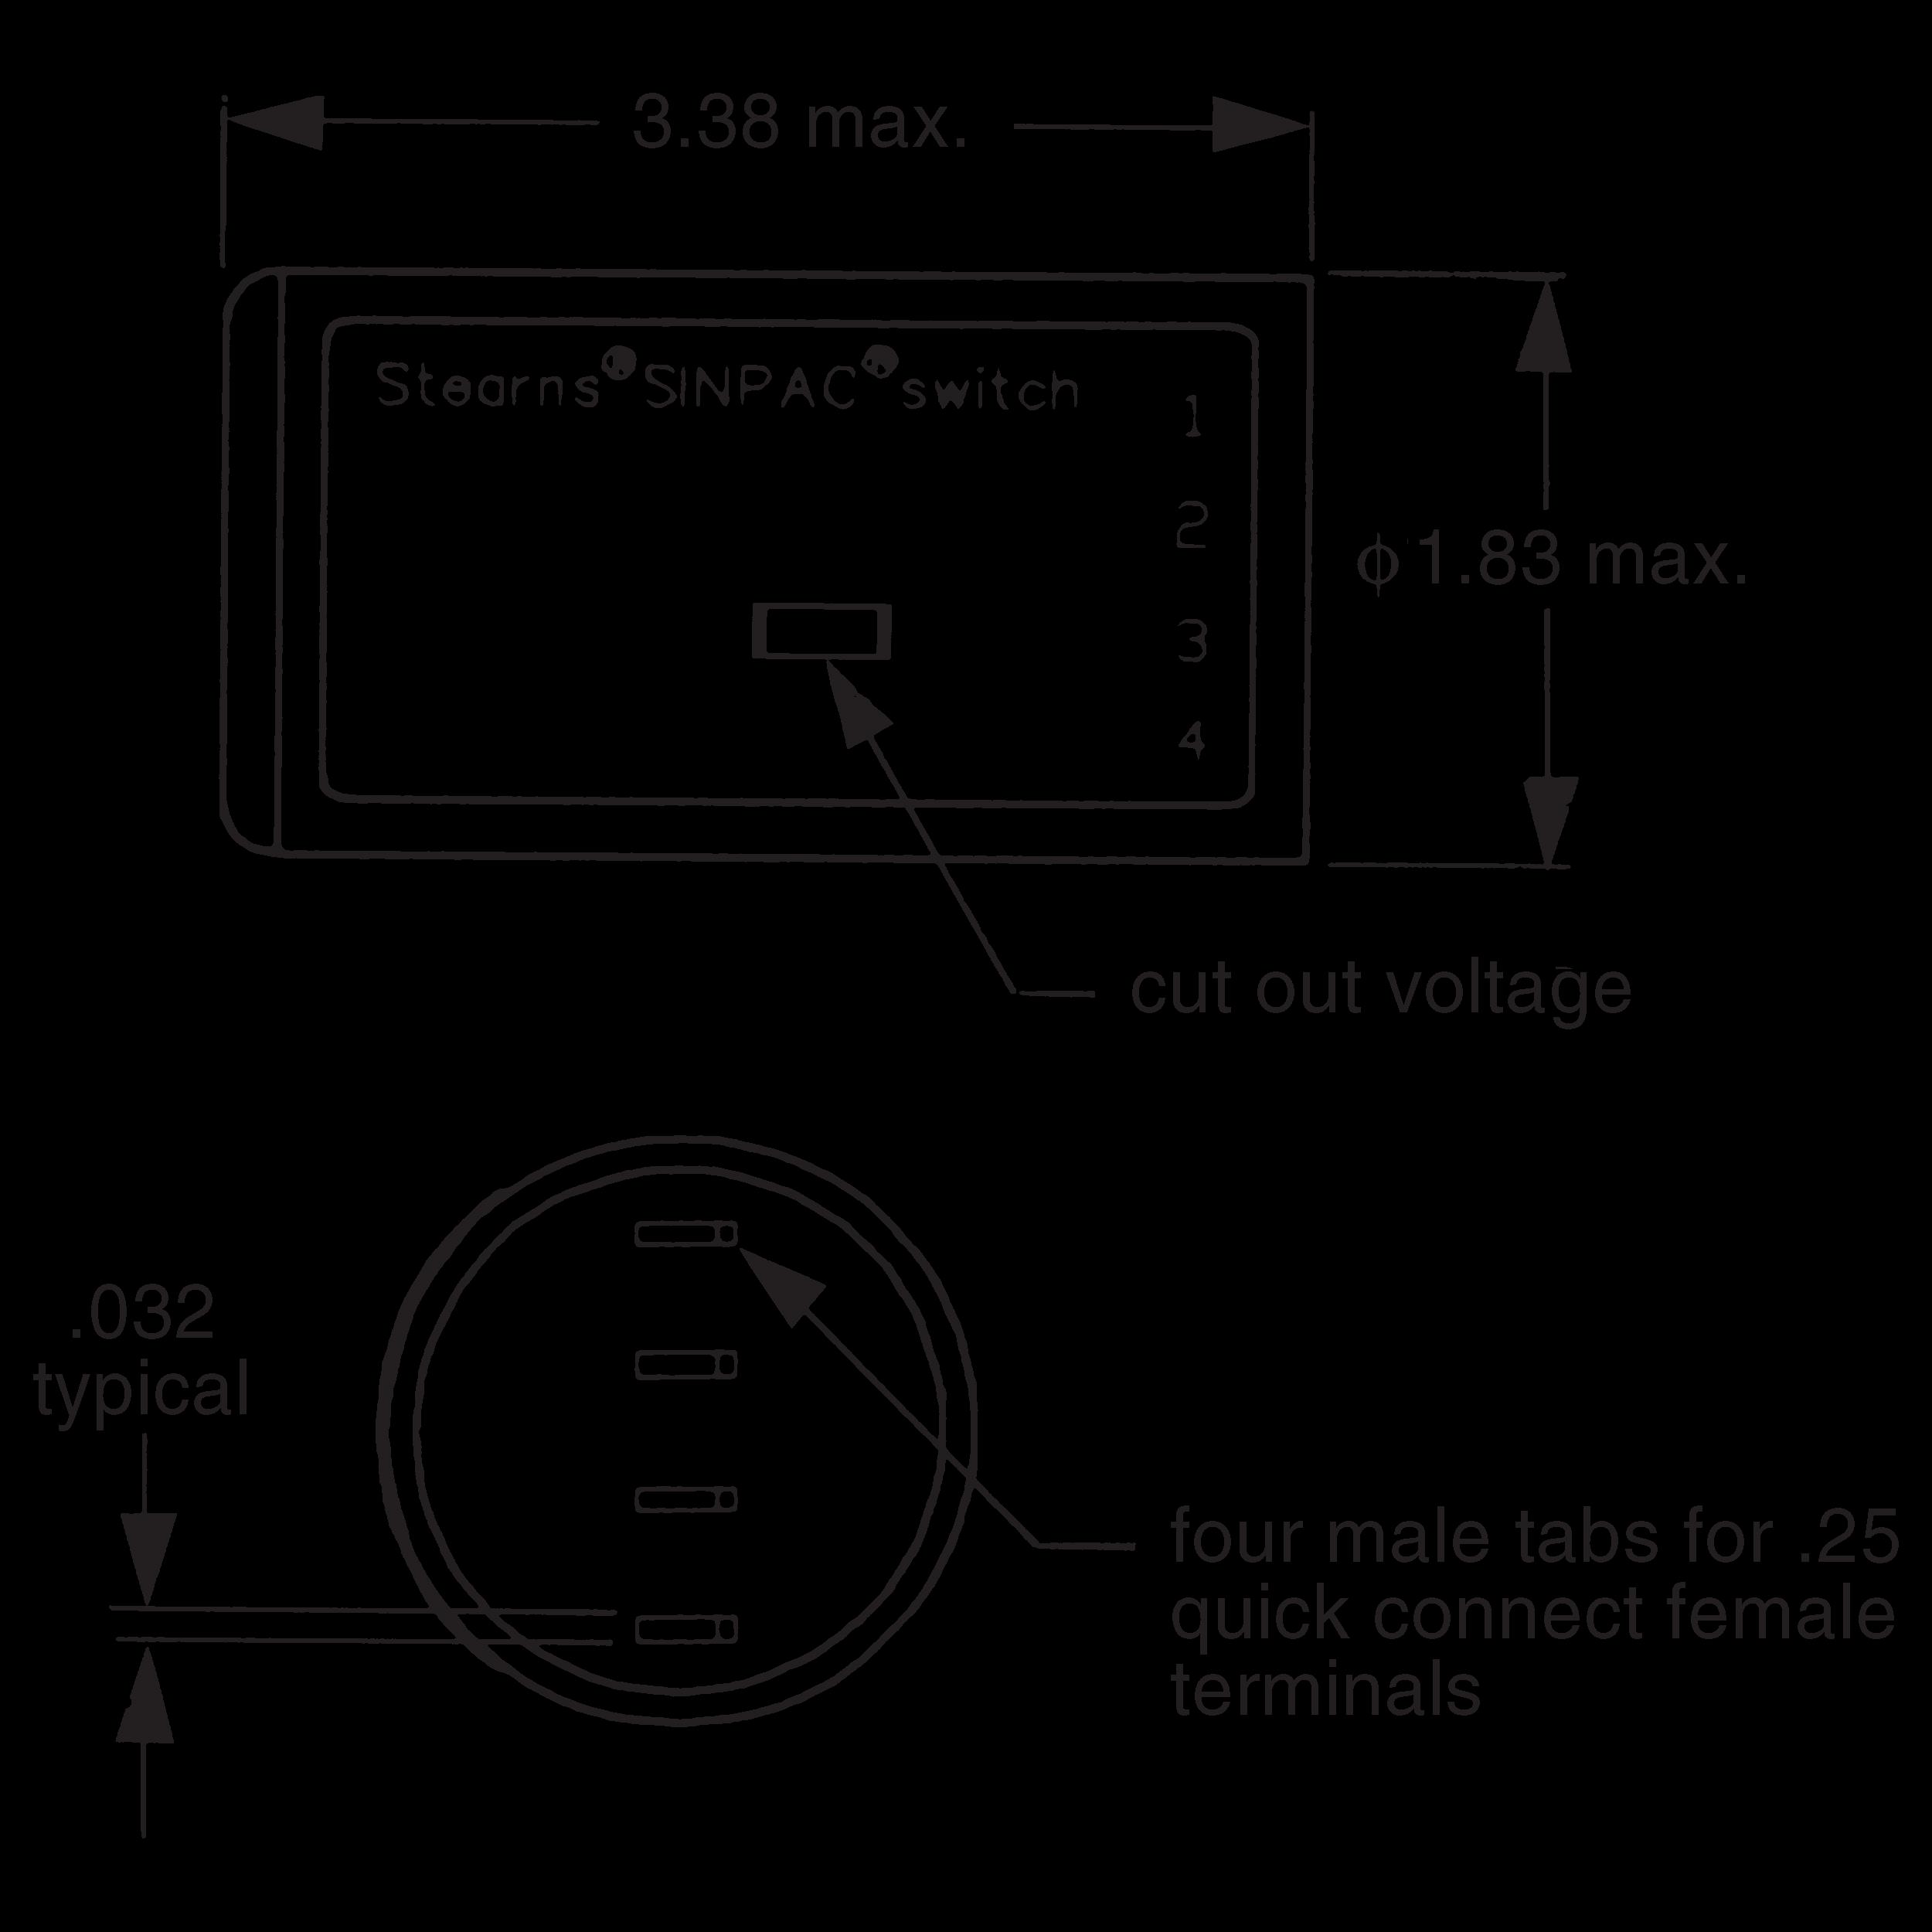 WRG-6786] Sinpac Switch Wiring Diagram on